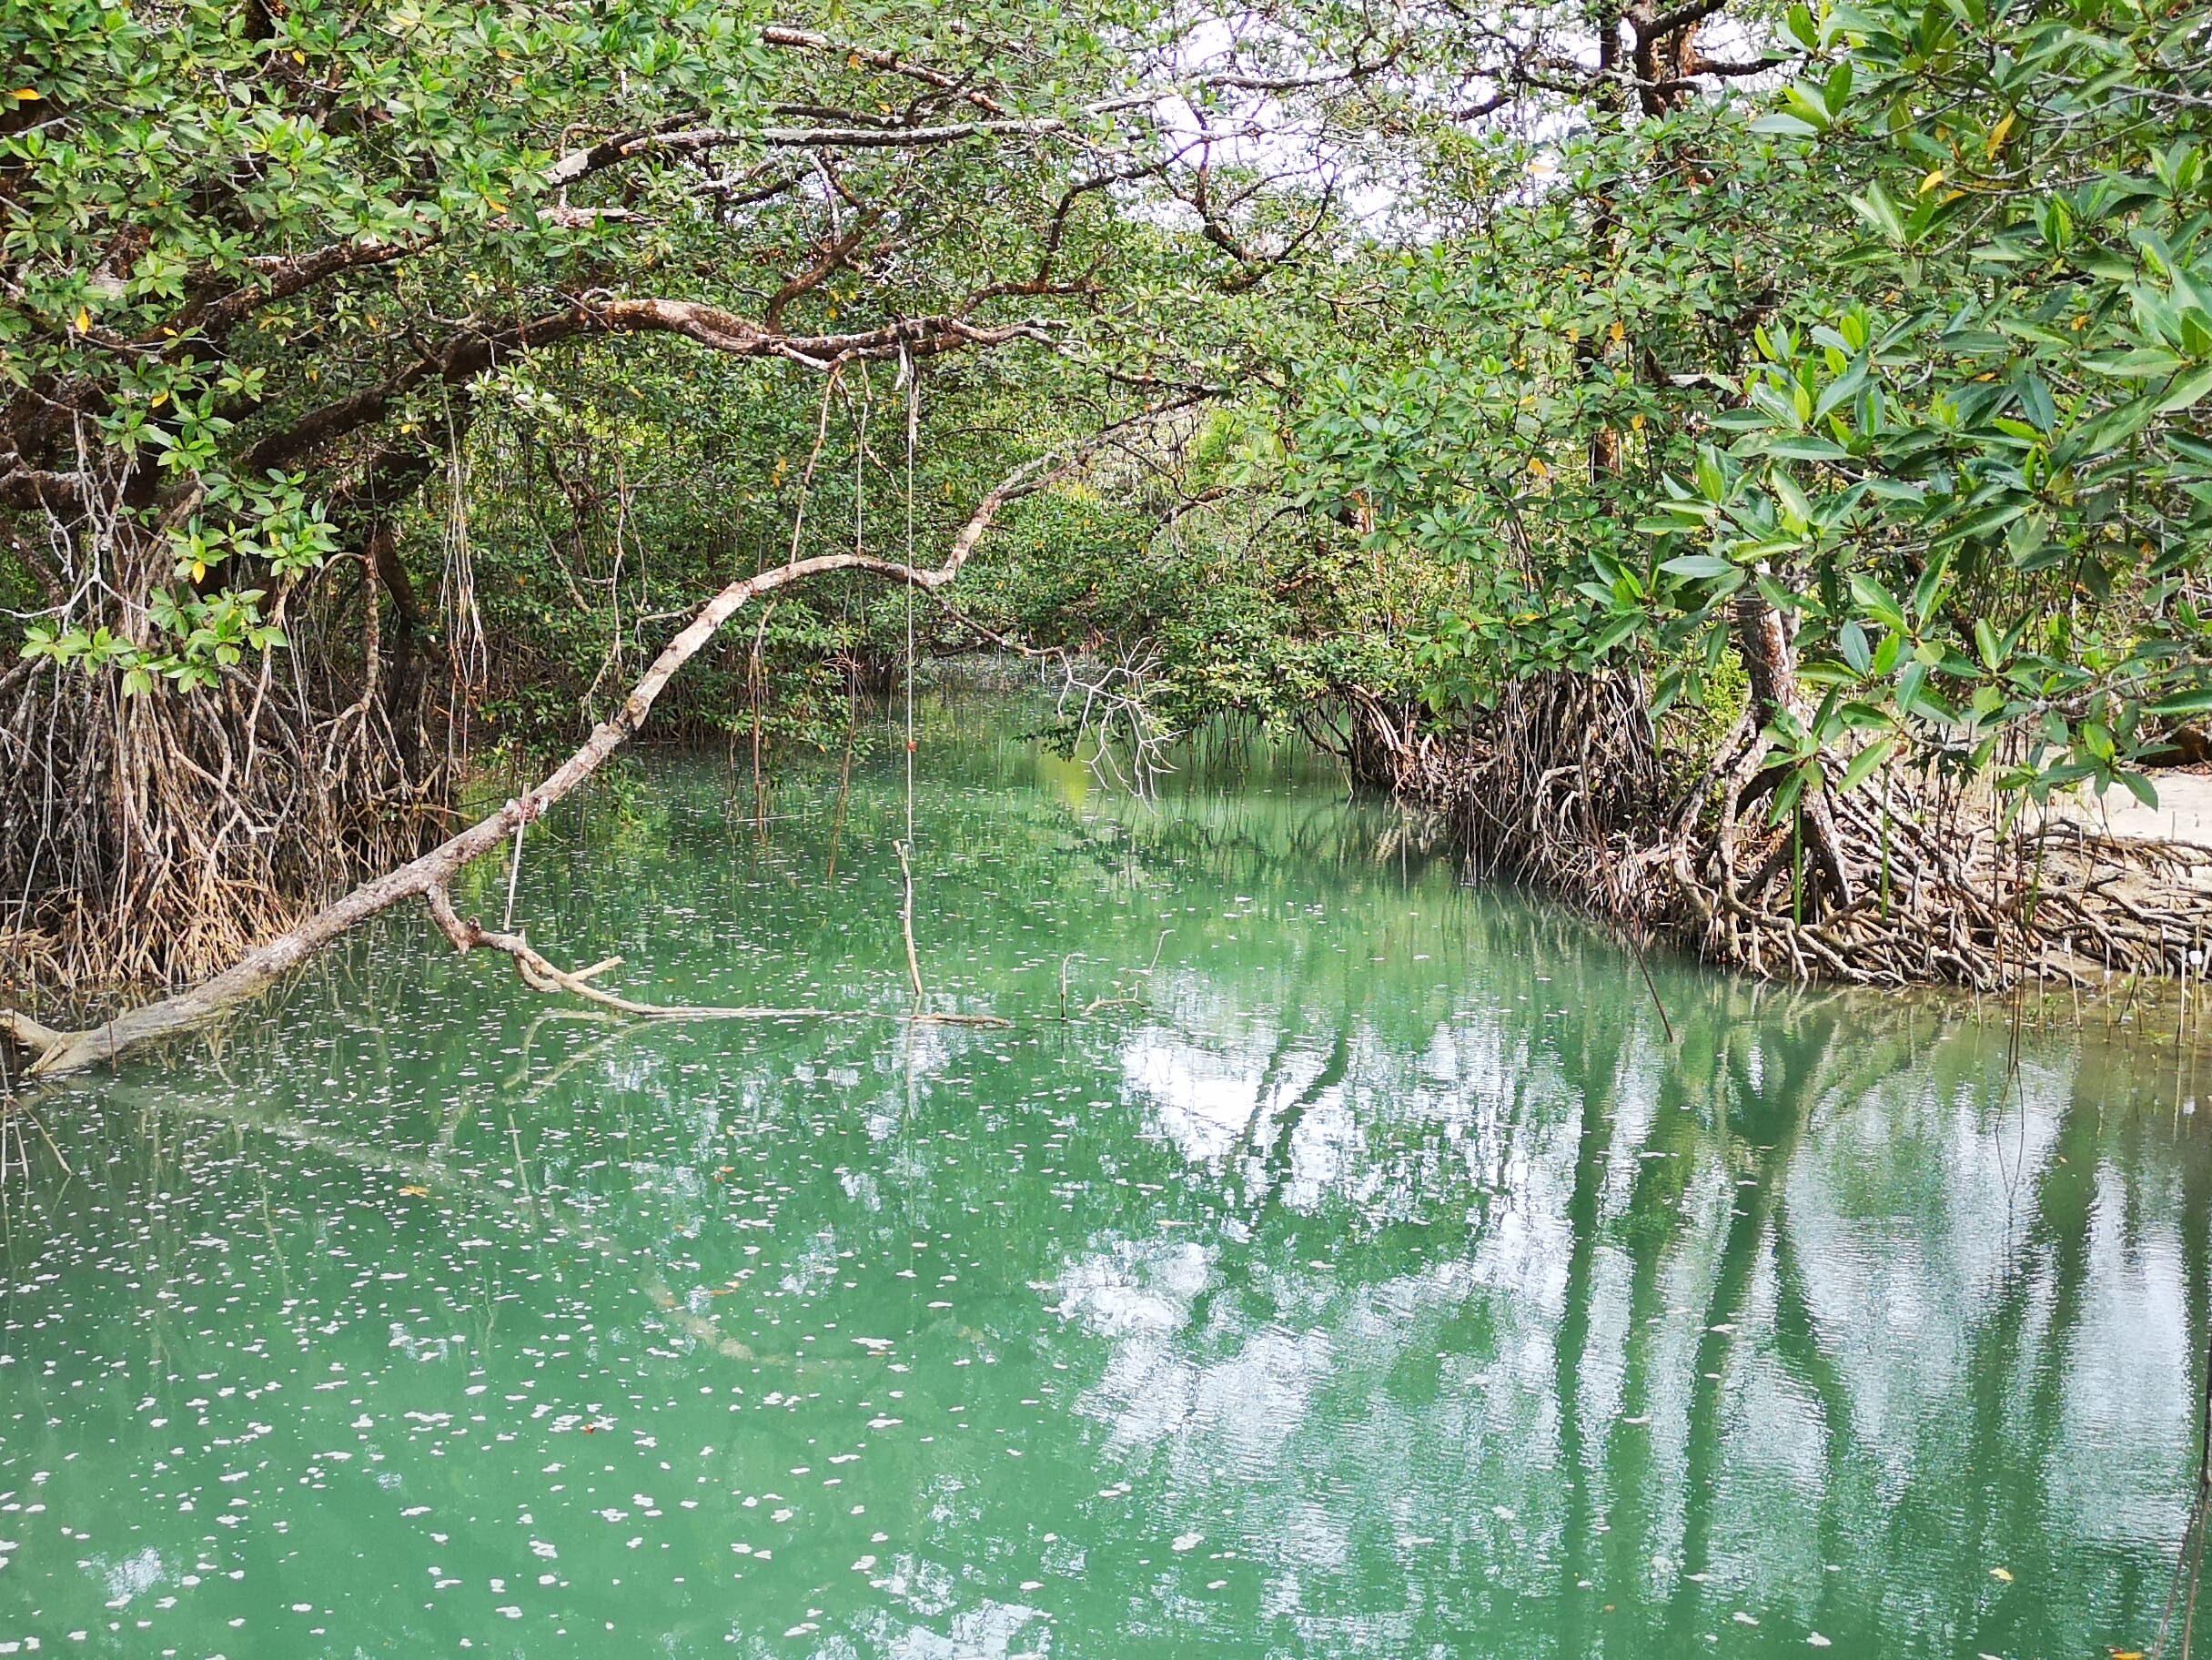 Projet MERCI | Mangrove Ecosystem and Javan Rhinoceros Conservation in Indonesia